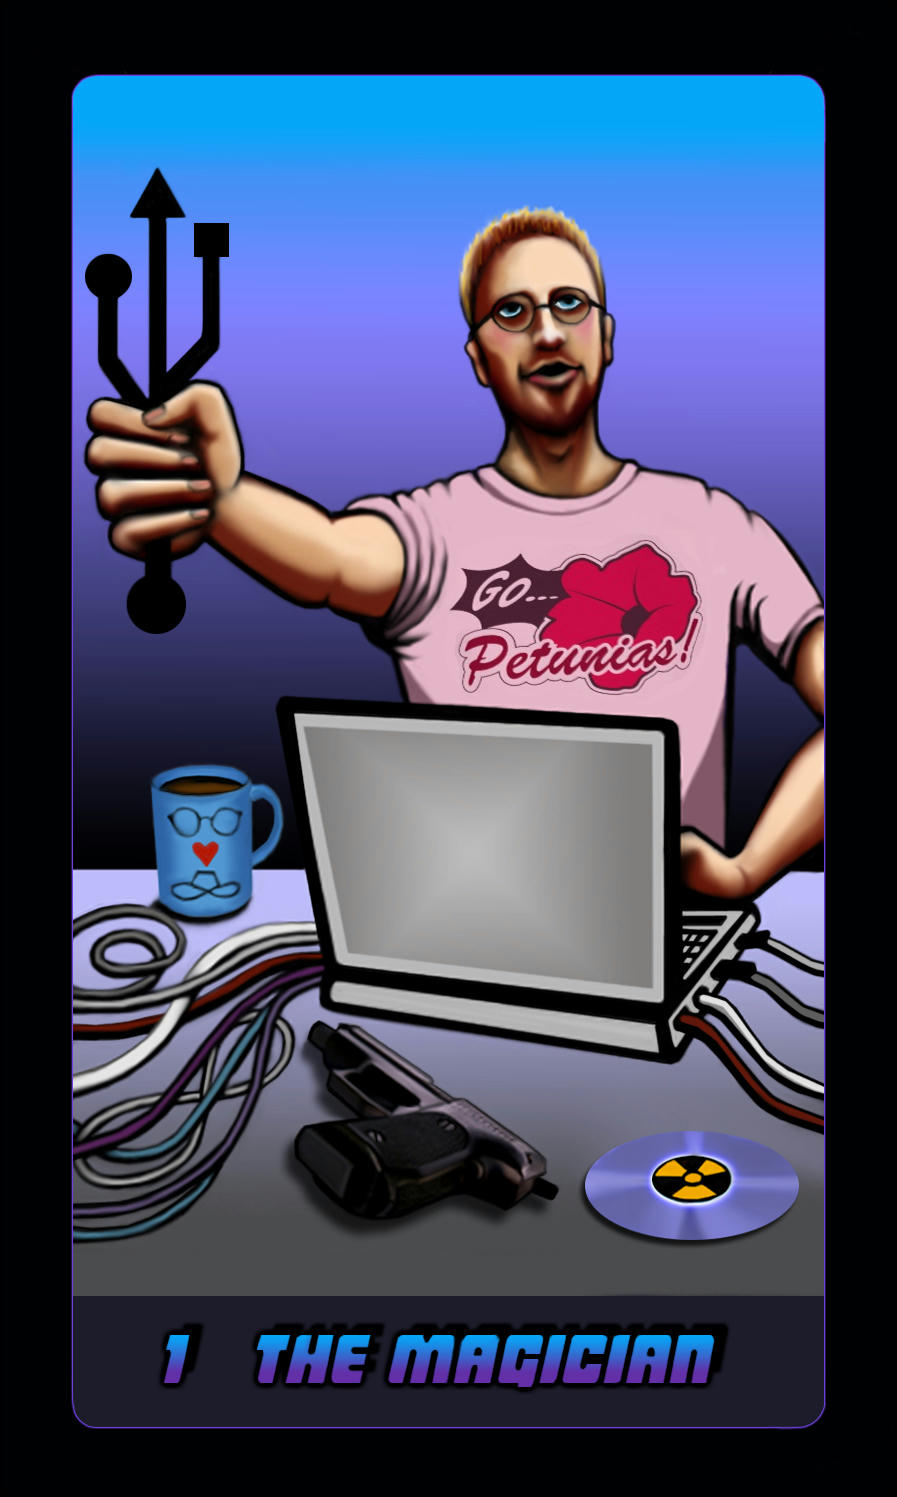 Jensen with USB hub as wand, laptop, Petunias T